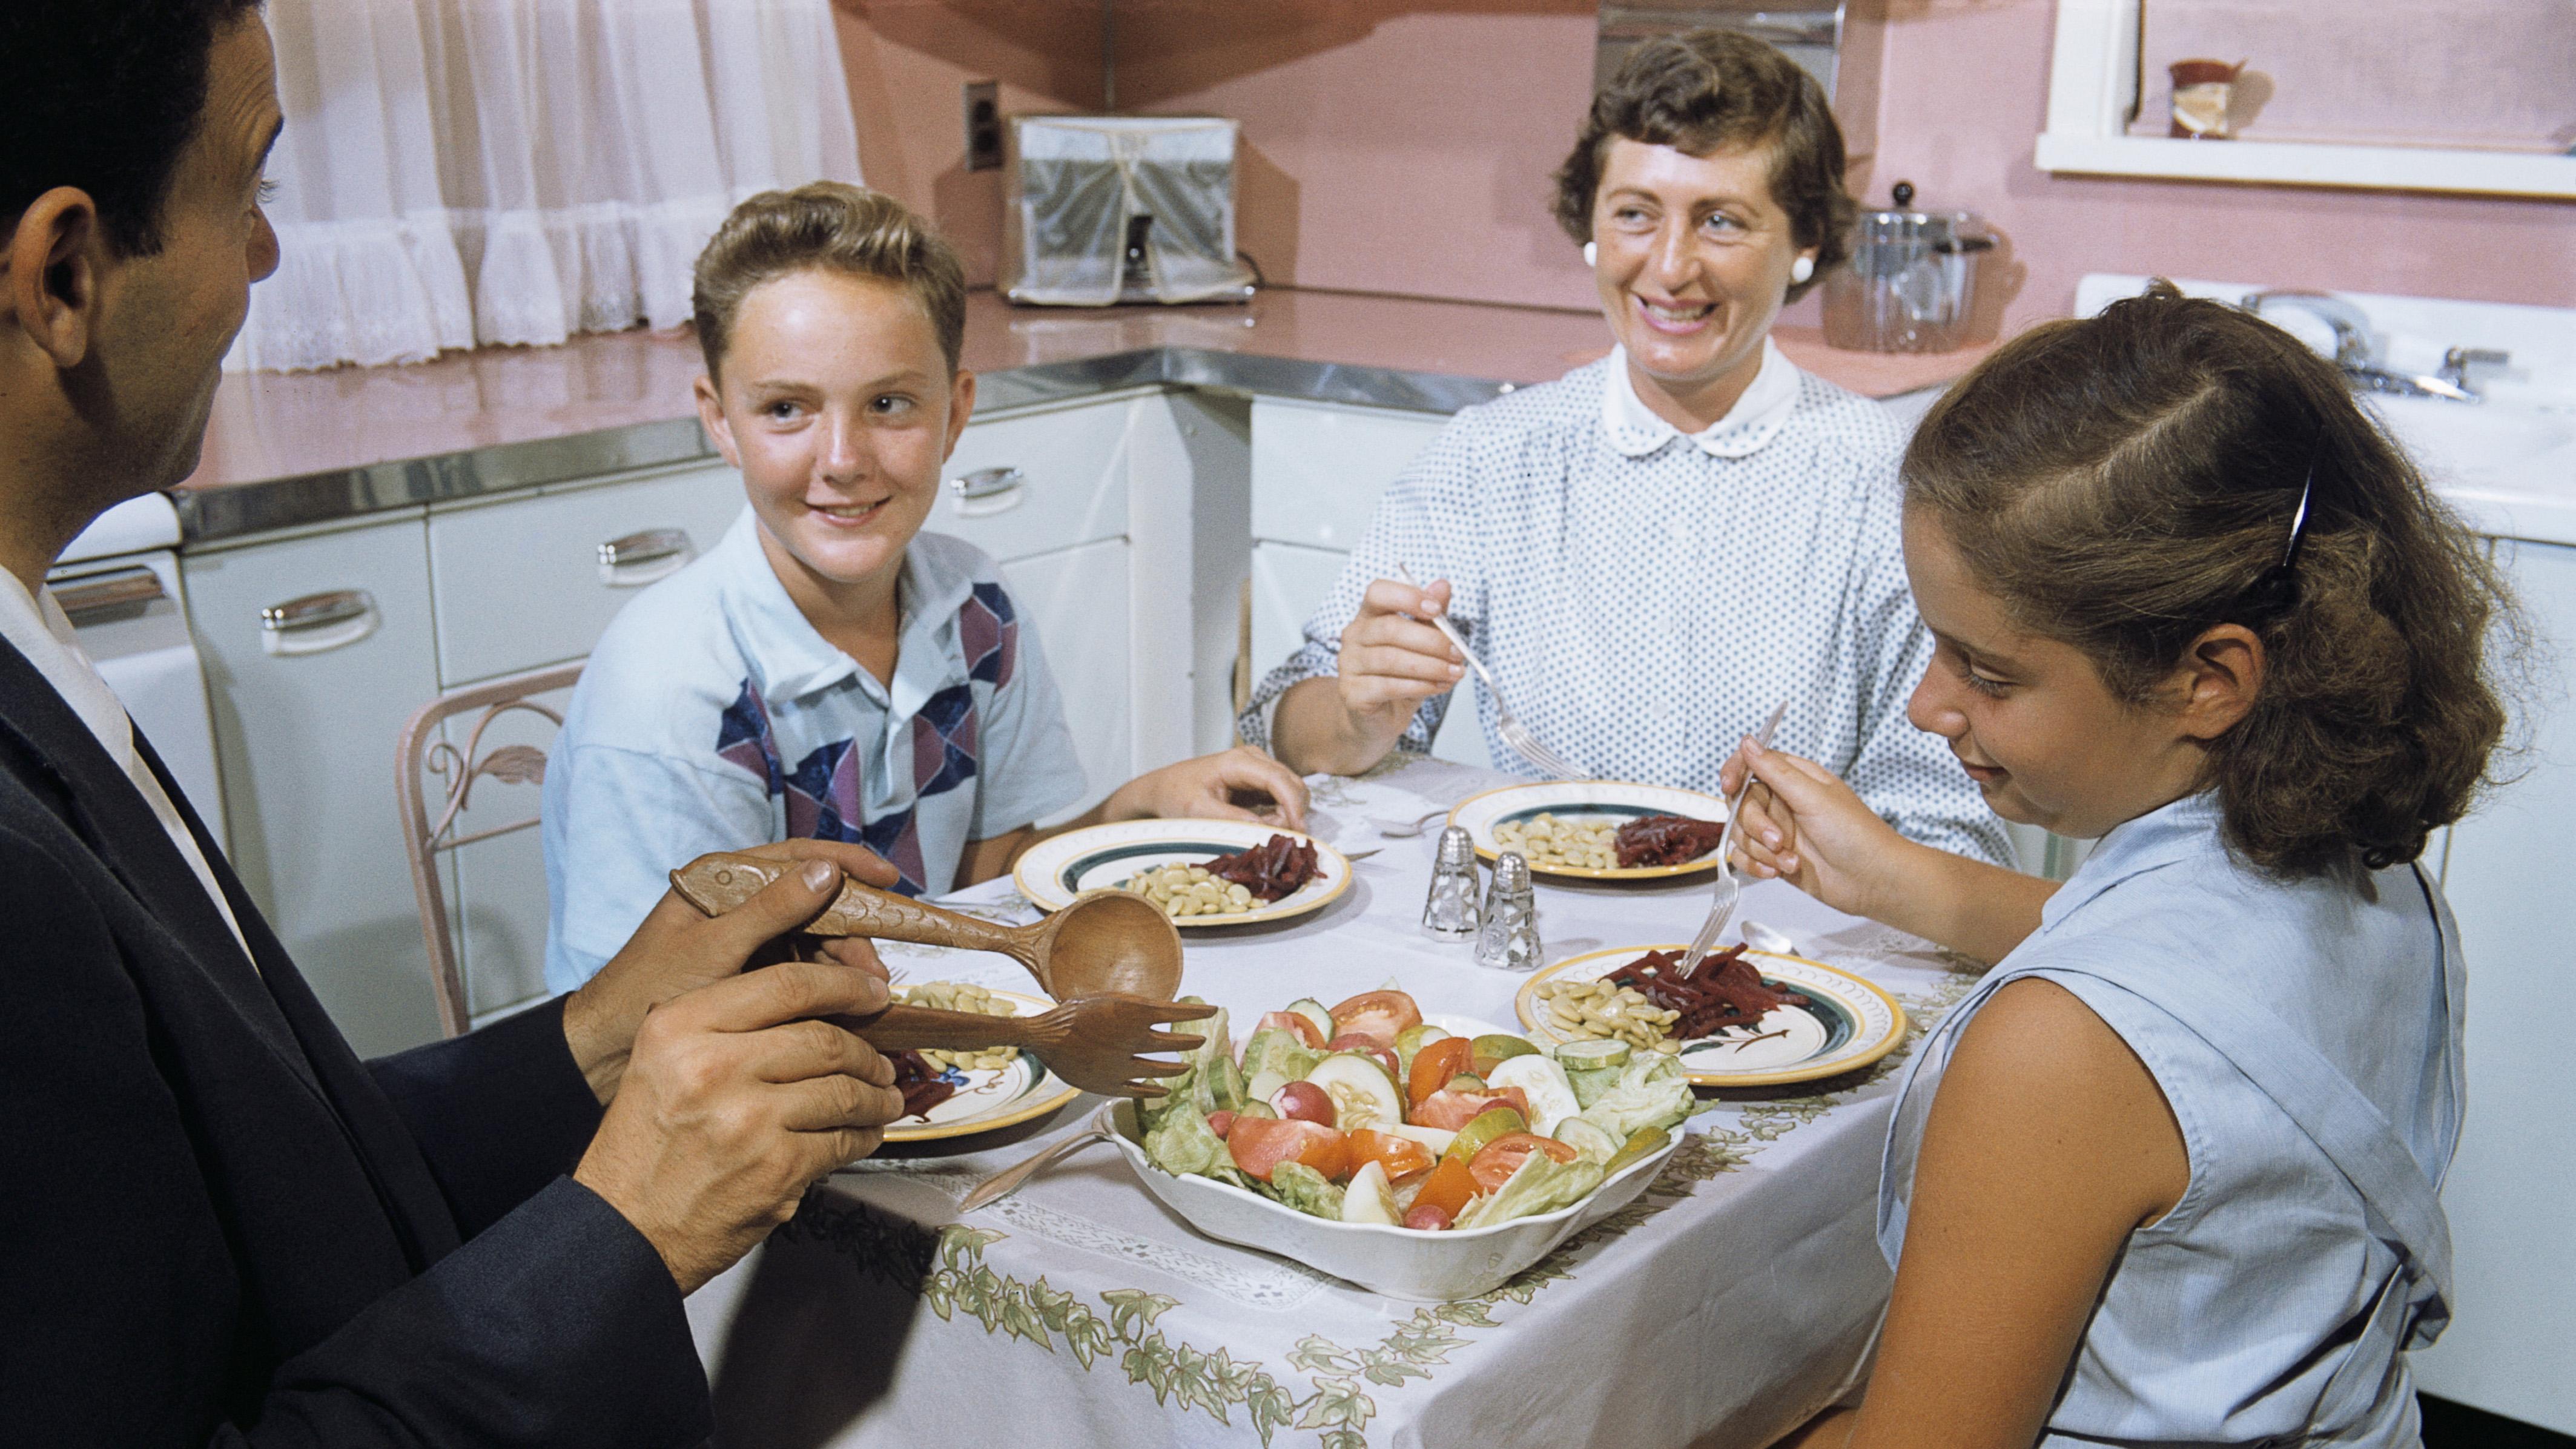 Talking politics at Thanksgiving: Just talk sports instead